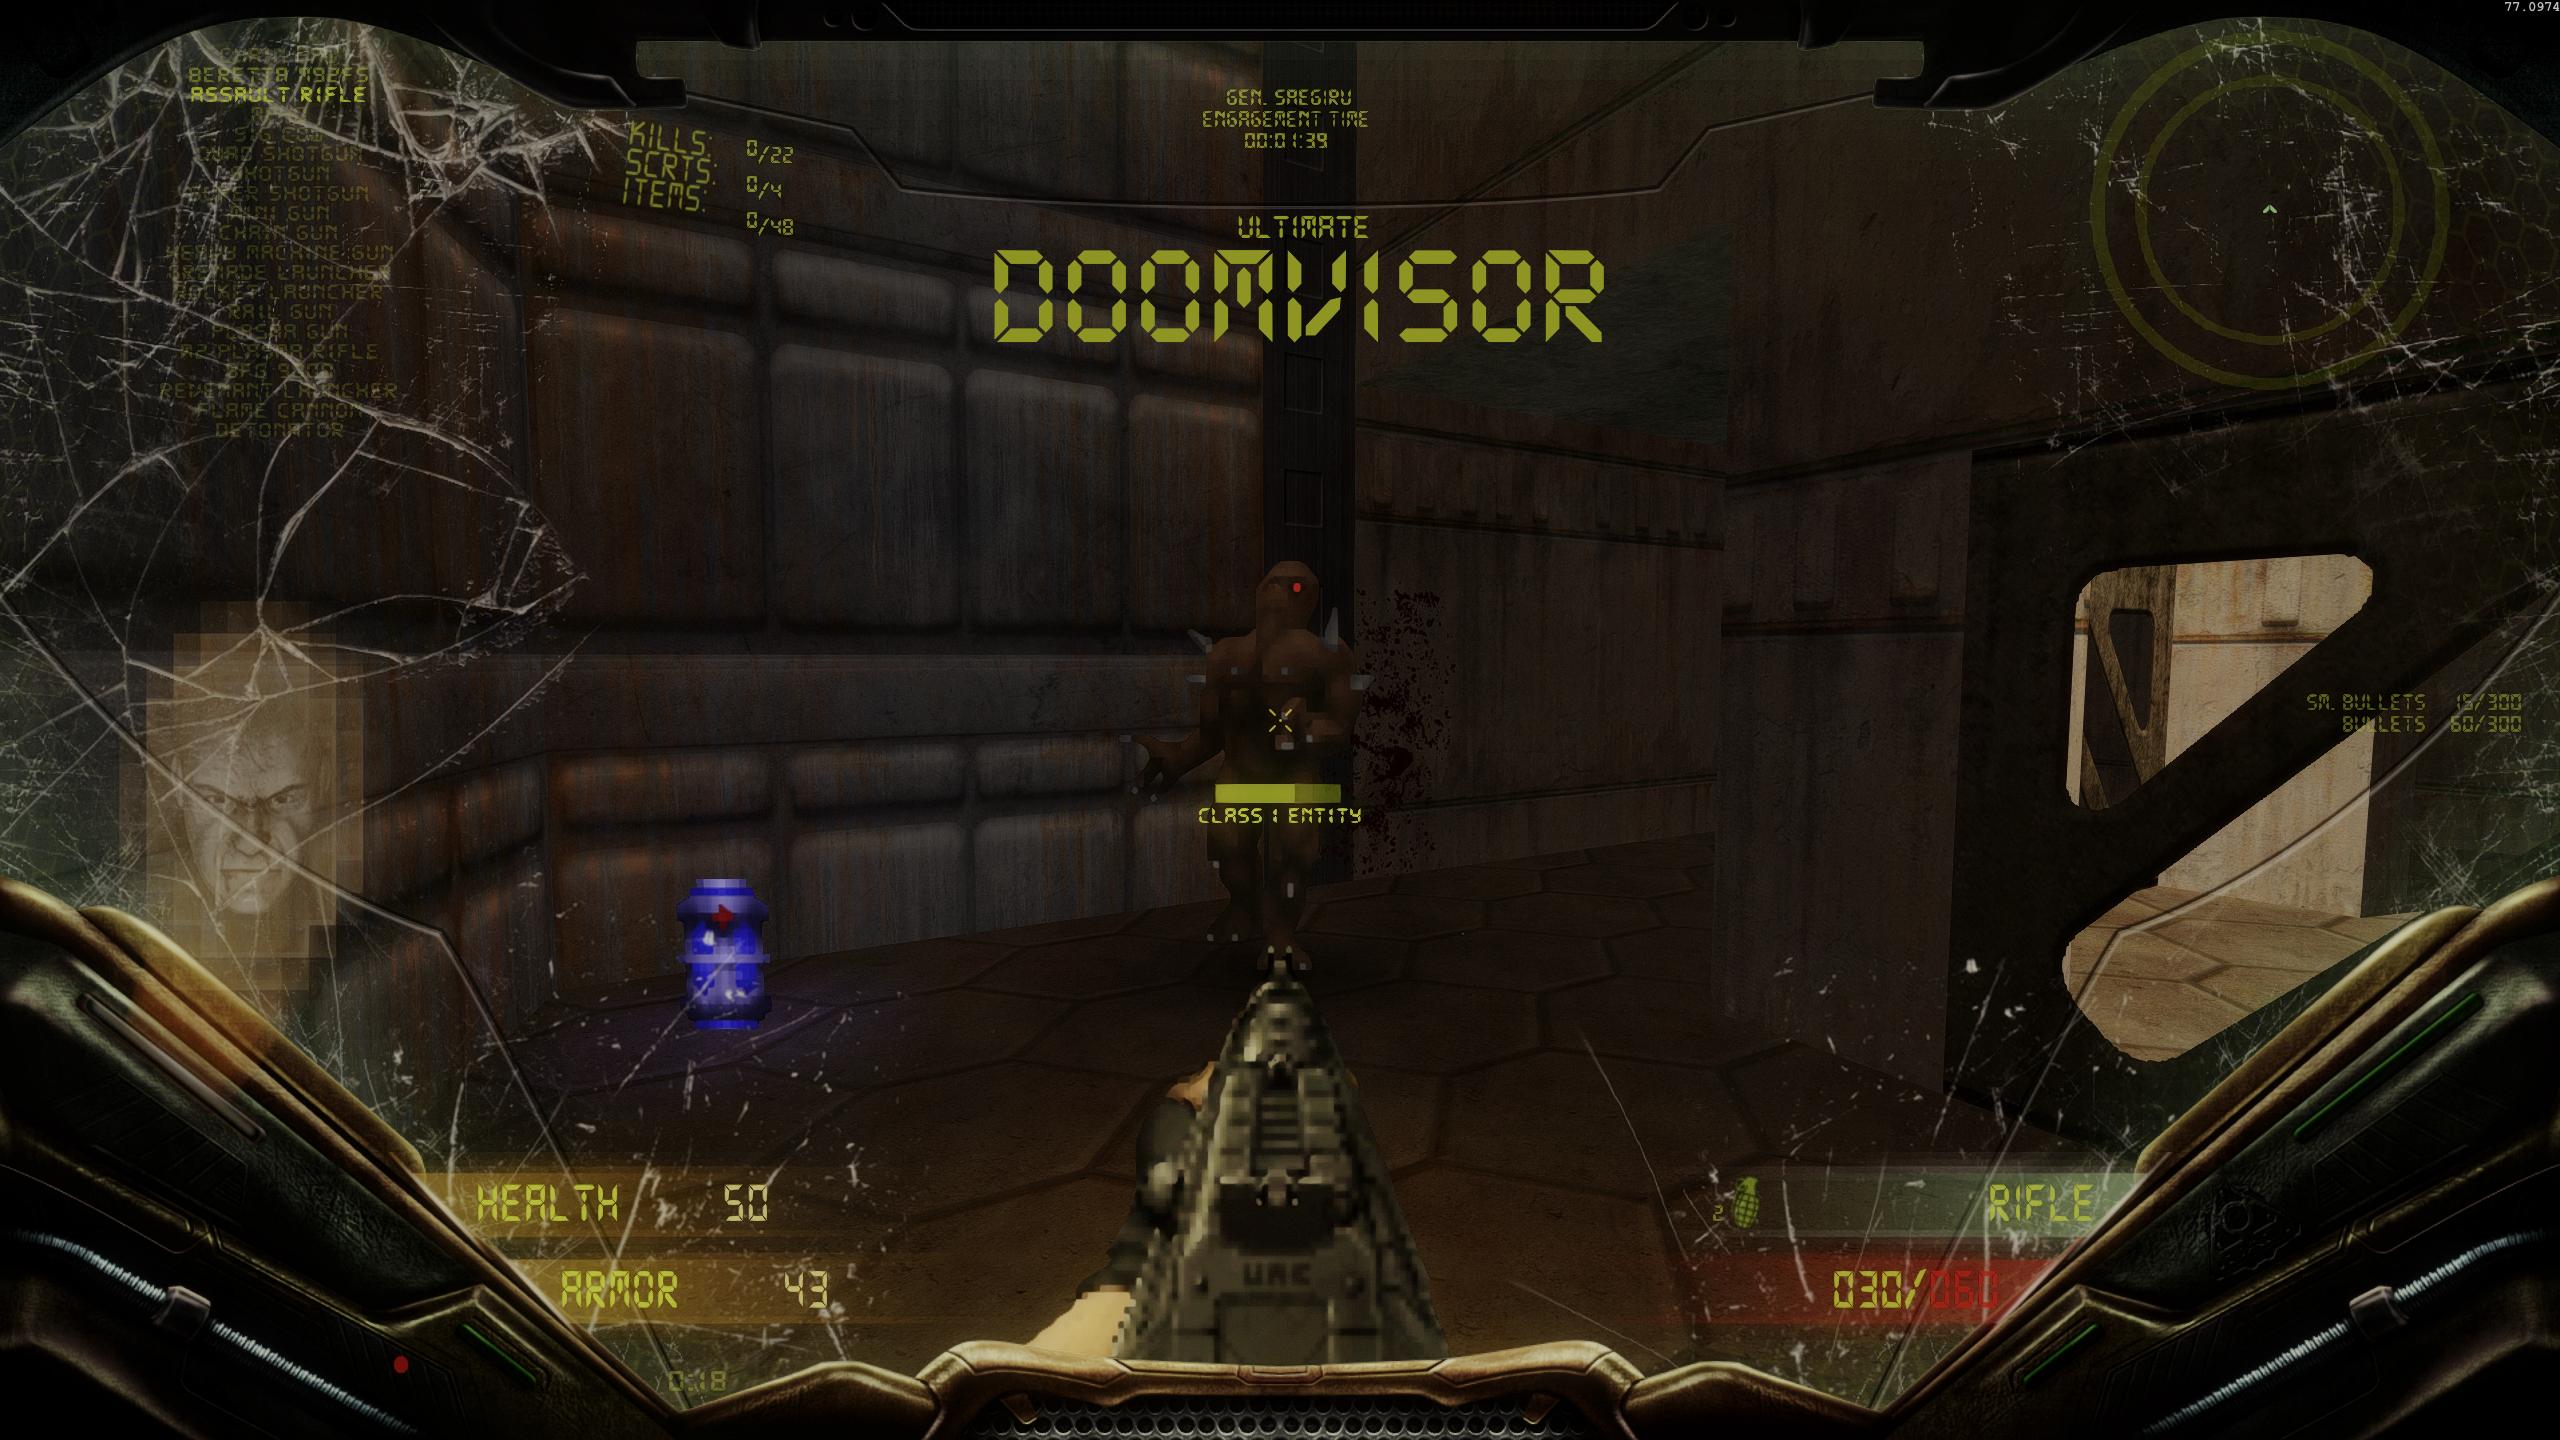 Ultimate DoomVisor HUD v2 13 ** 2019-06-07** addon - Mod DB